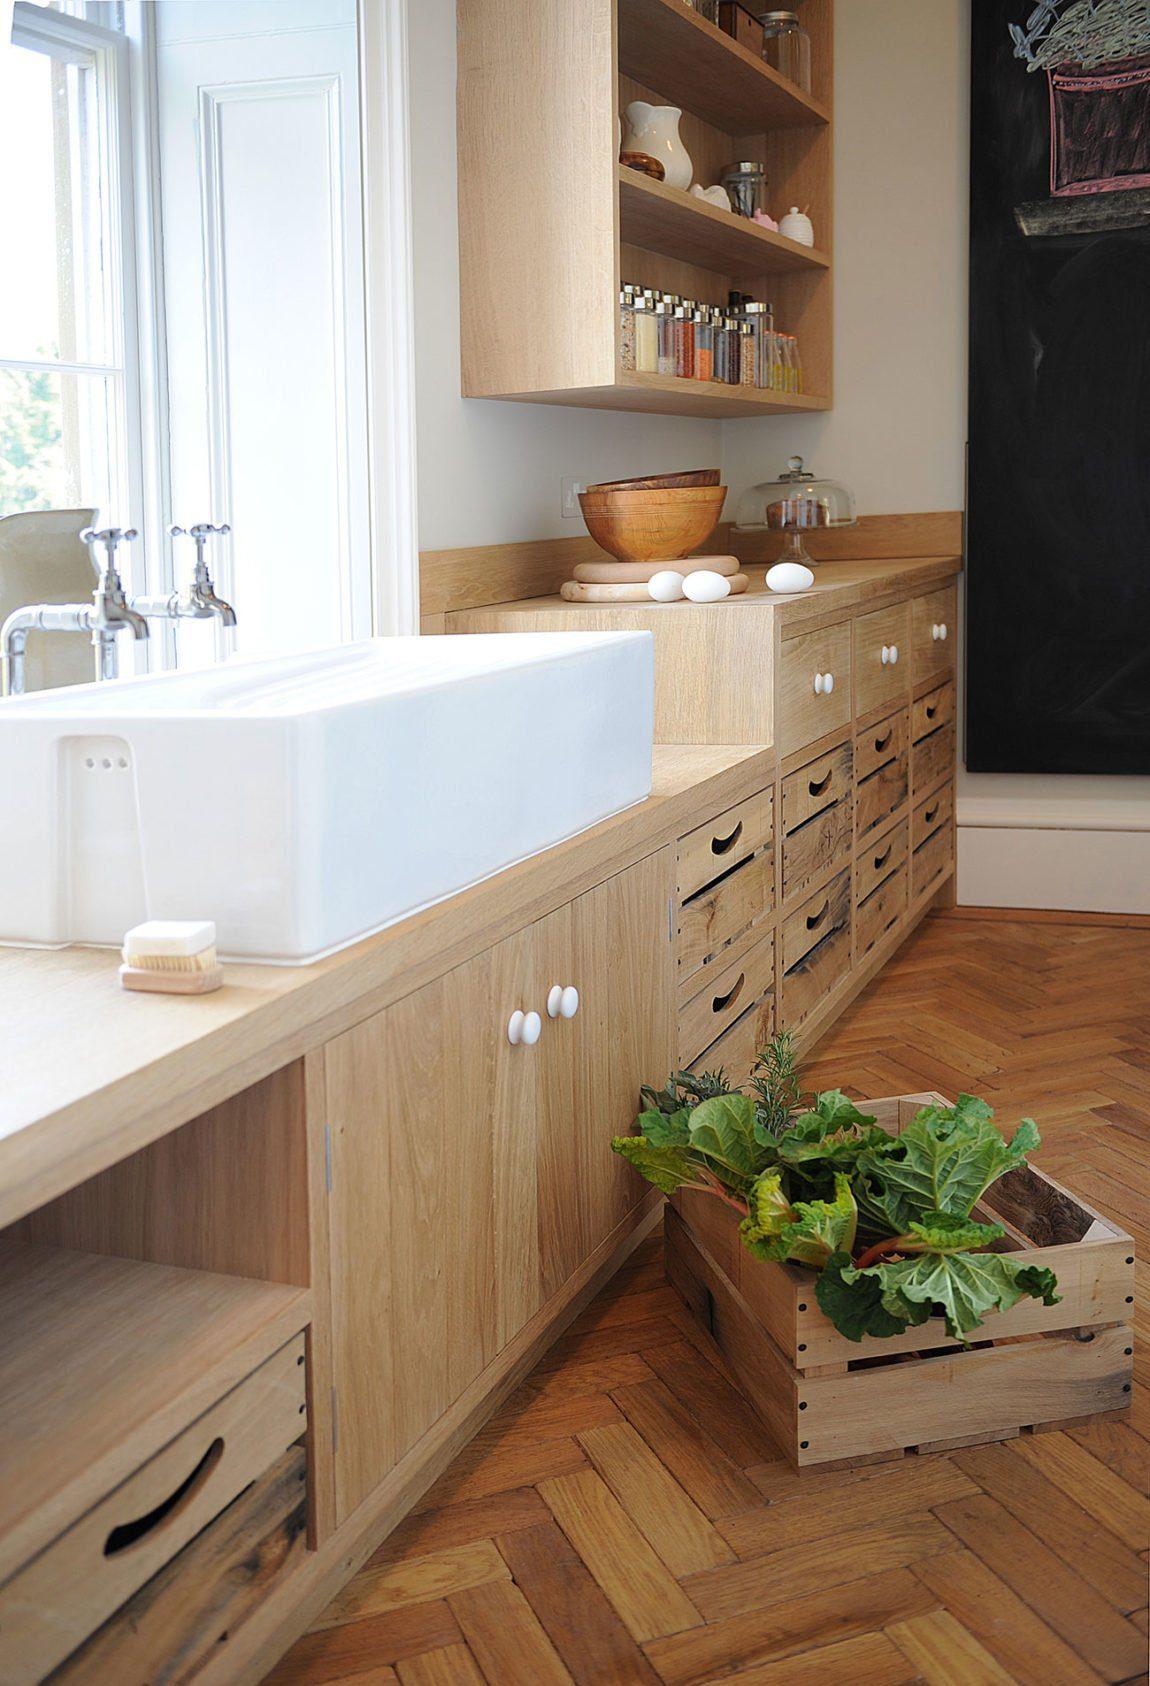 Kitchen Scullery Designs Artichoke Ltd